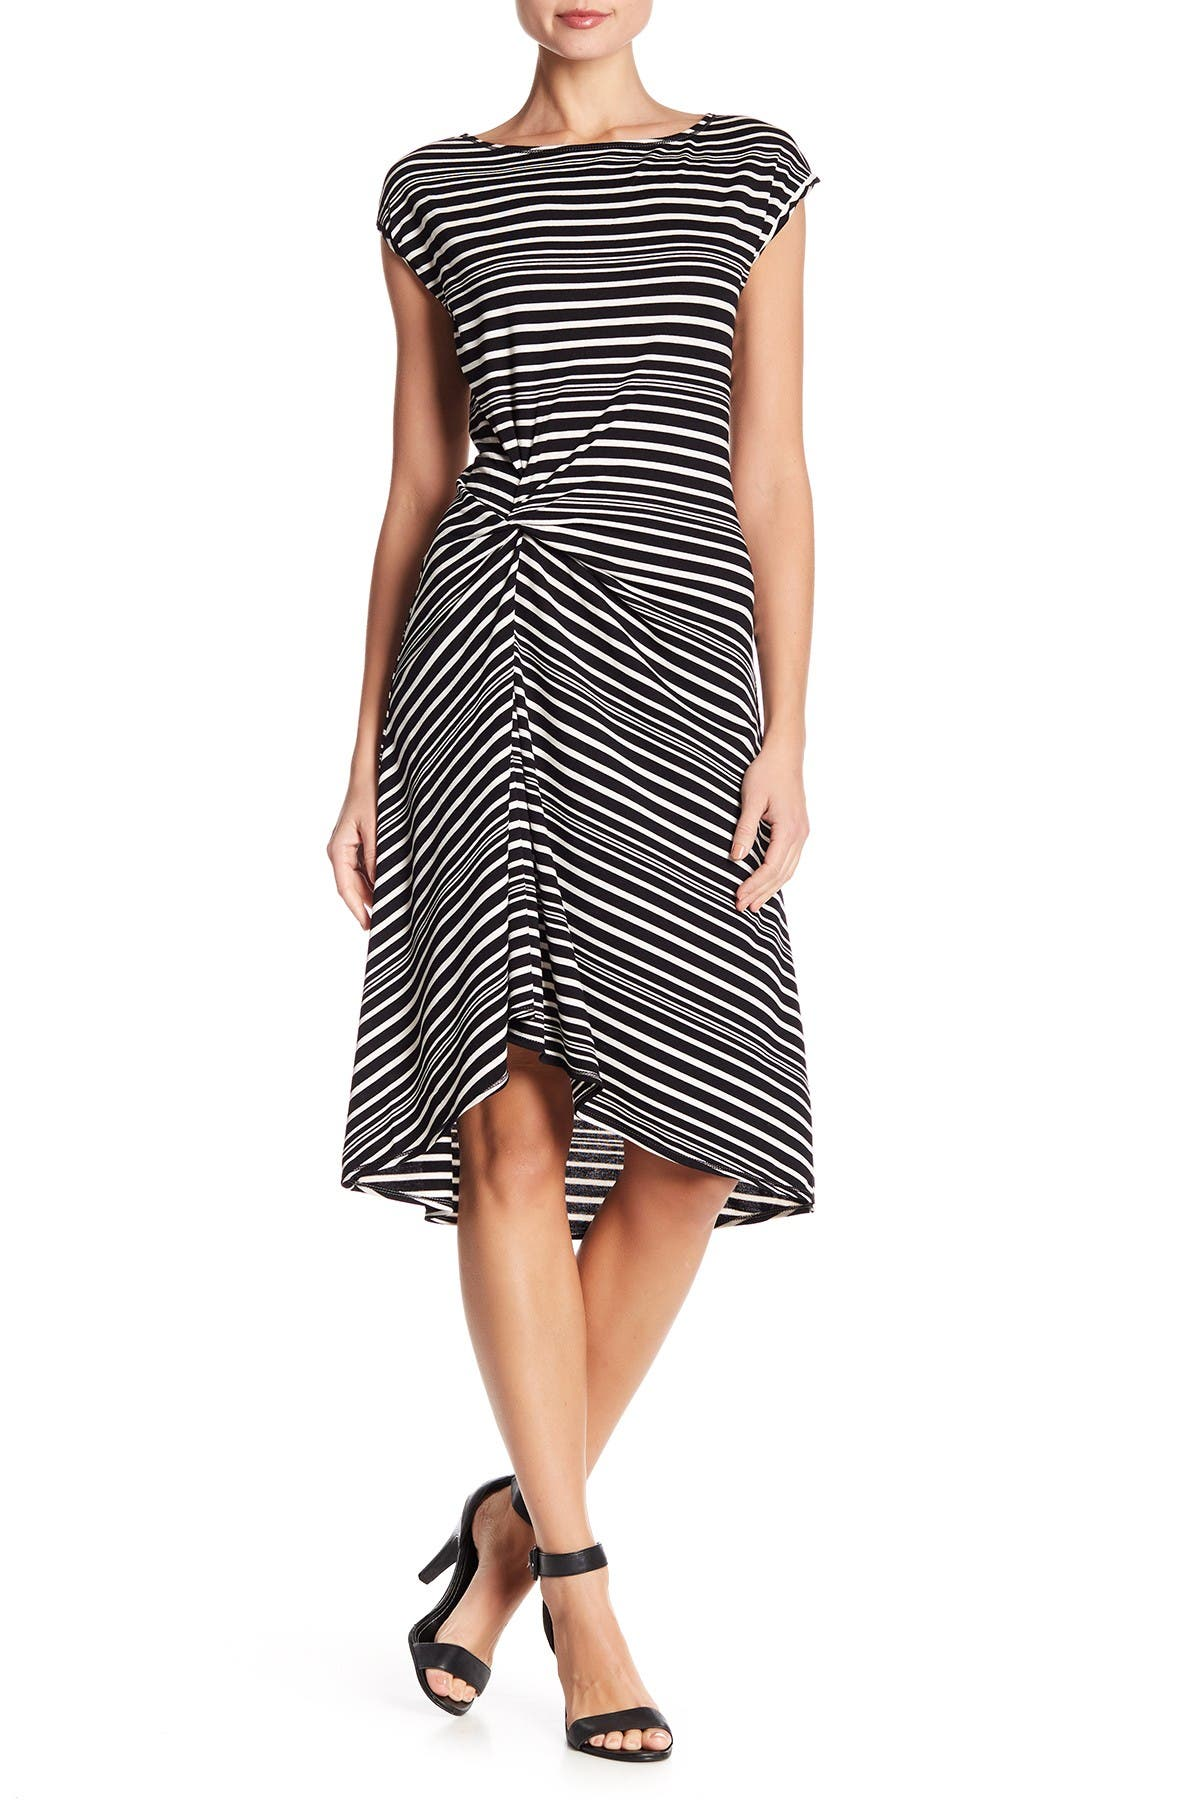 Image of Max Studio Striped Cap Sleeve Hi-Lo Dress